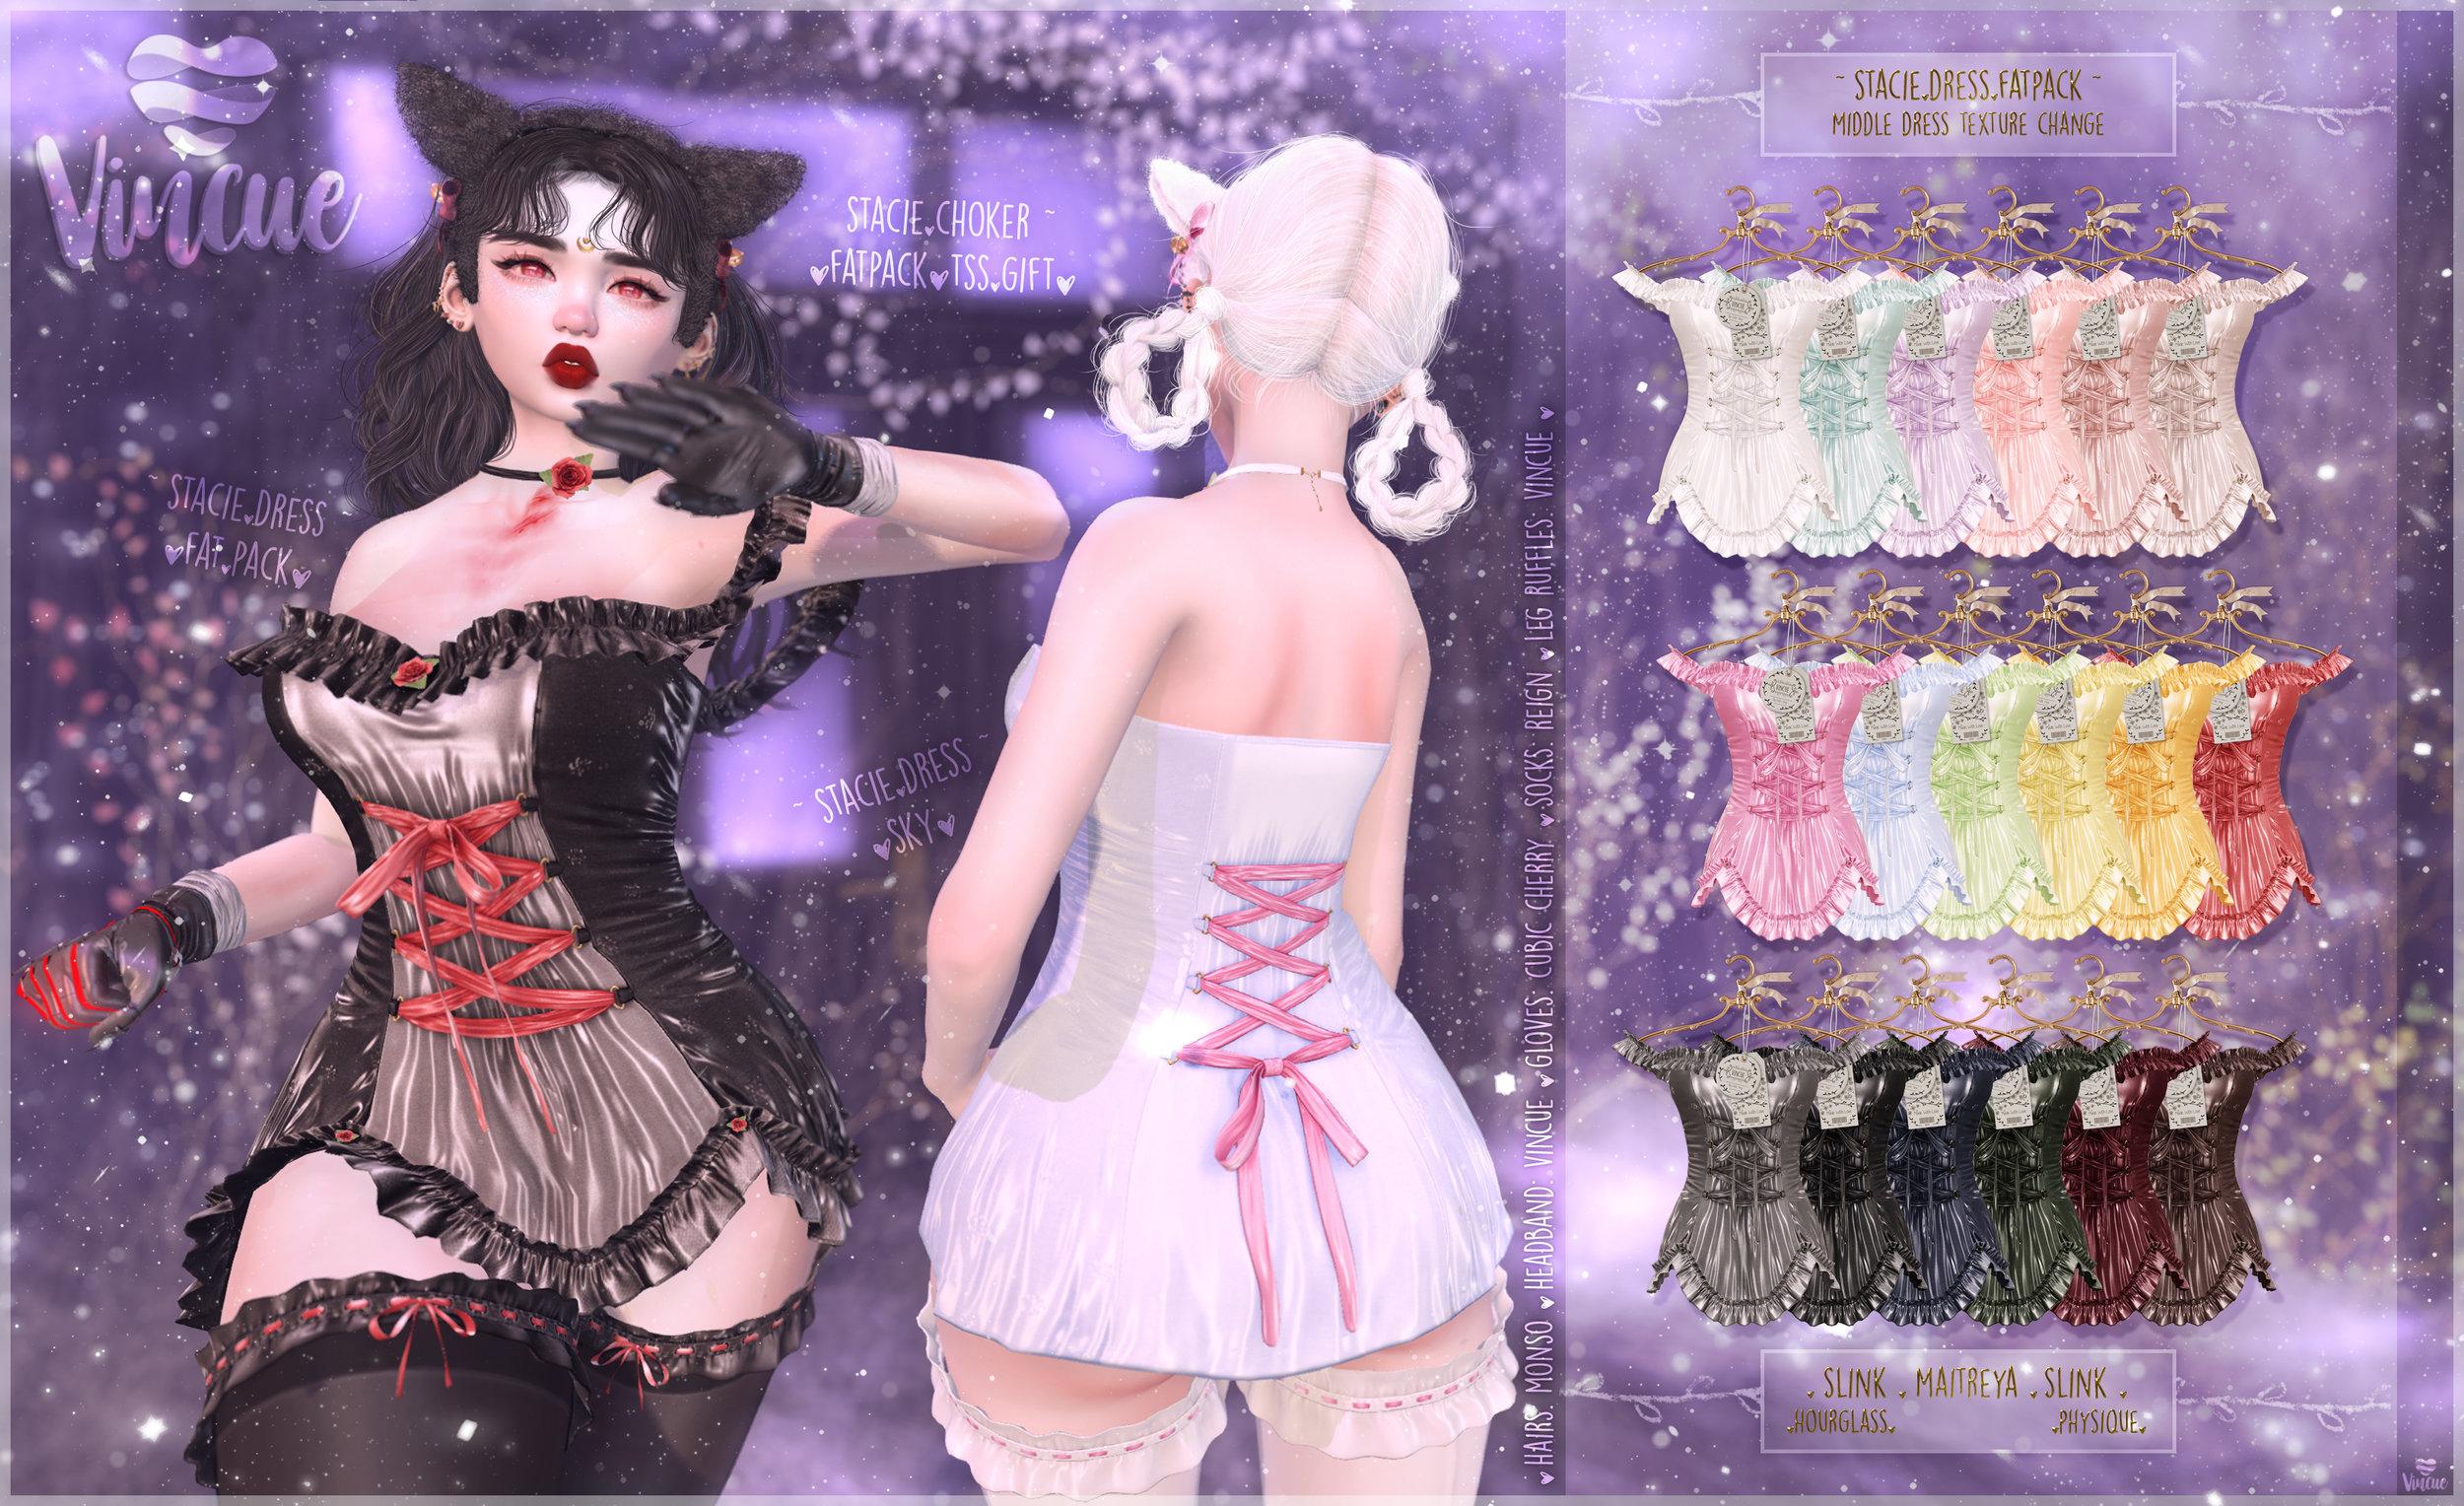 Vincue - Stacie Dress.jpg